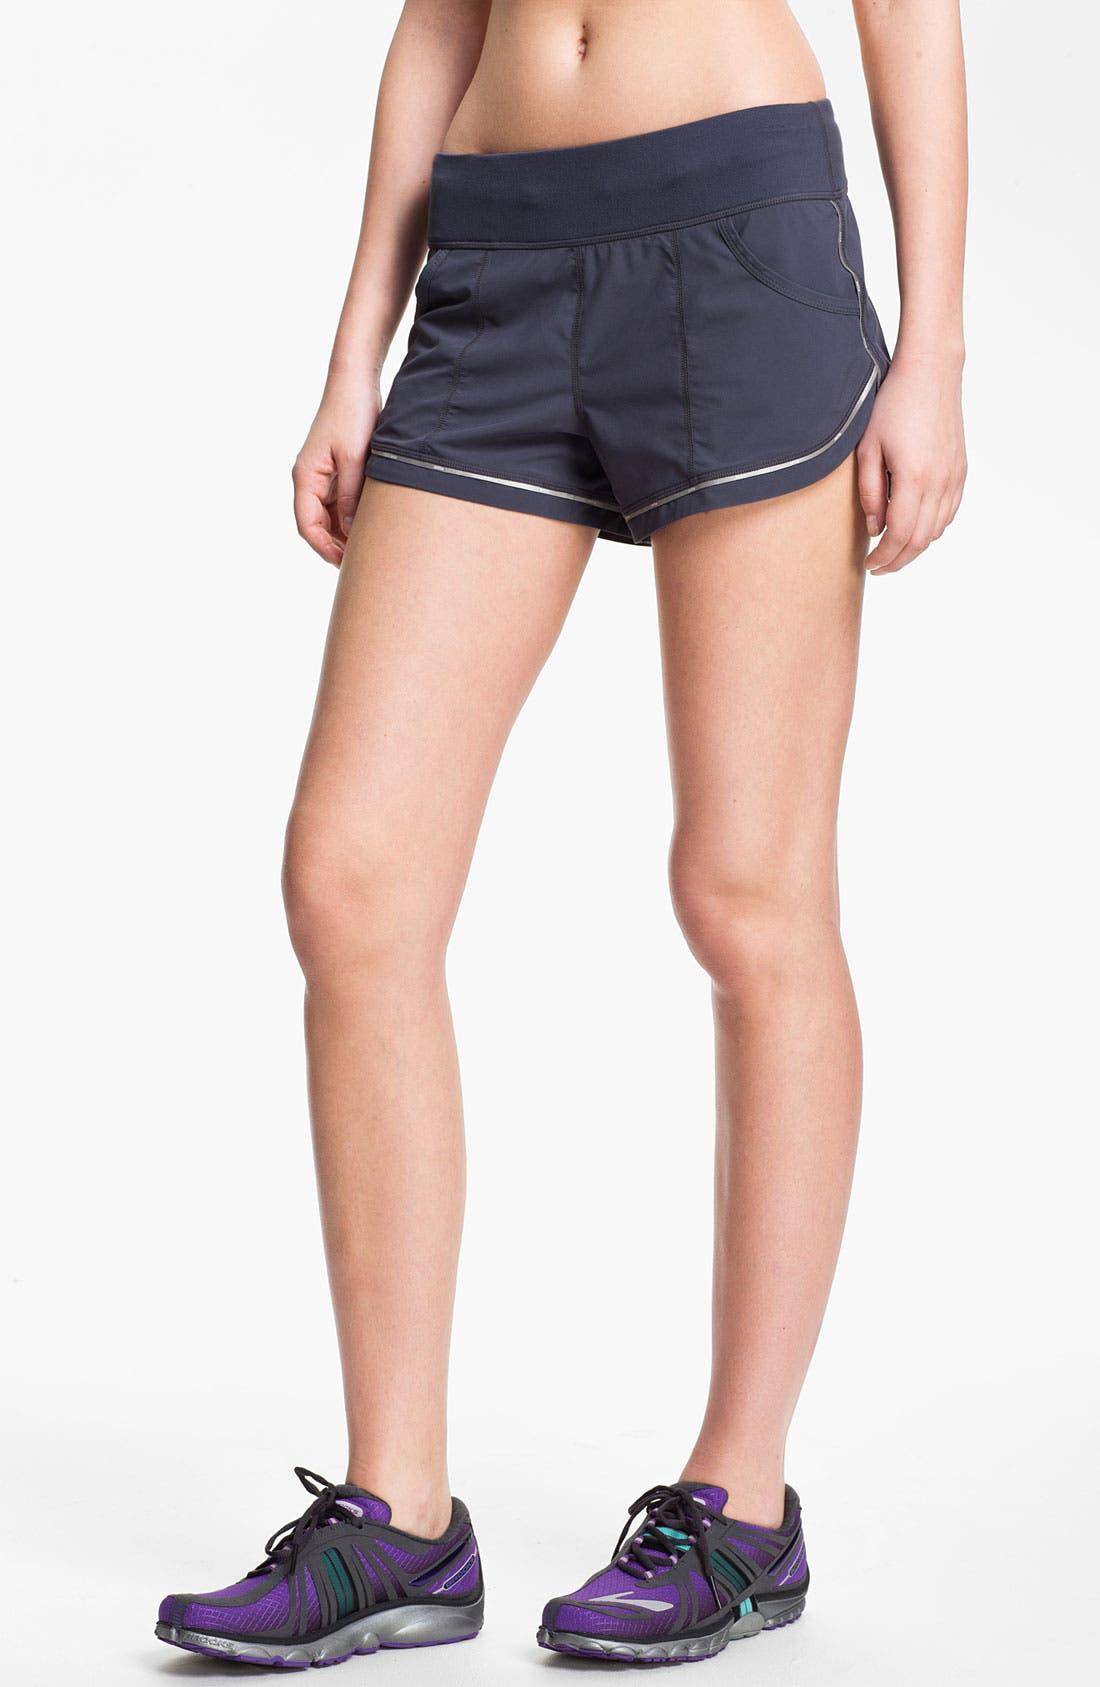 Alternate Image 1 Selected - Zella 'Go' Shorts